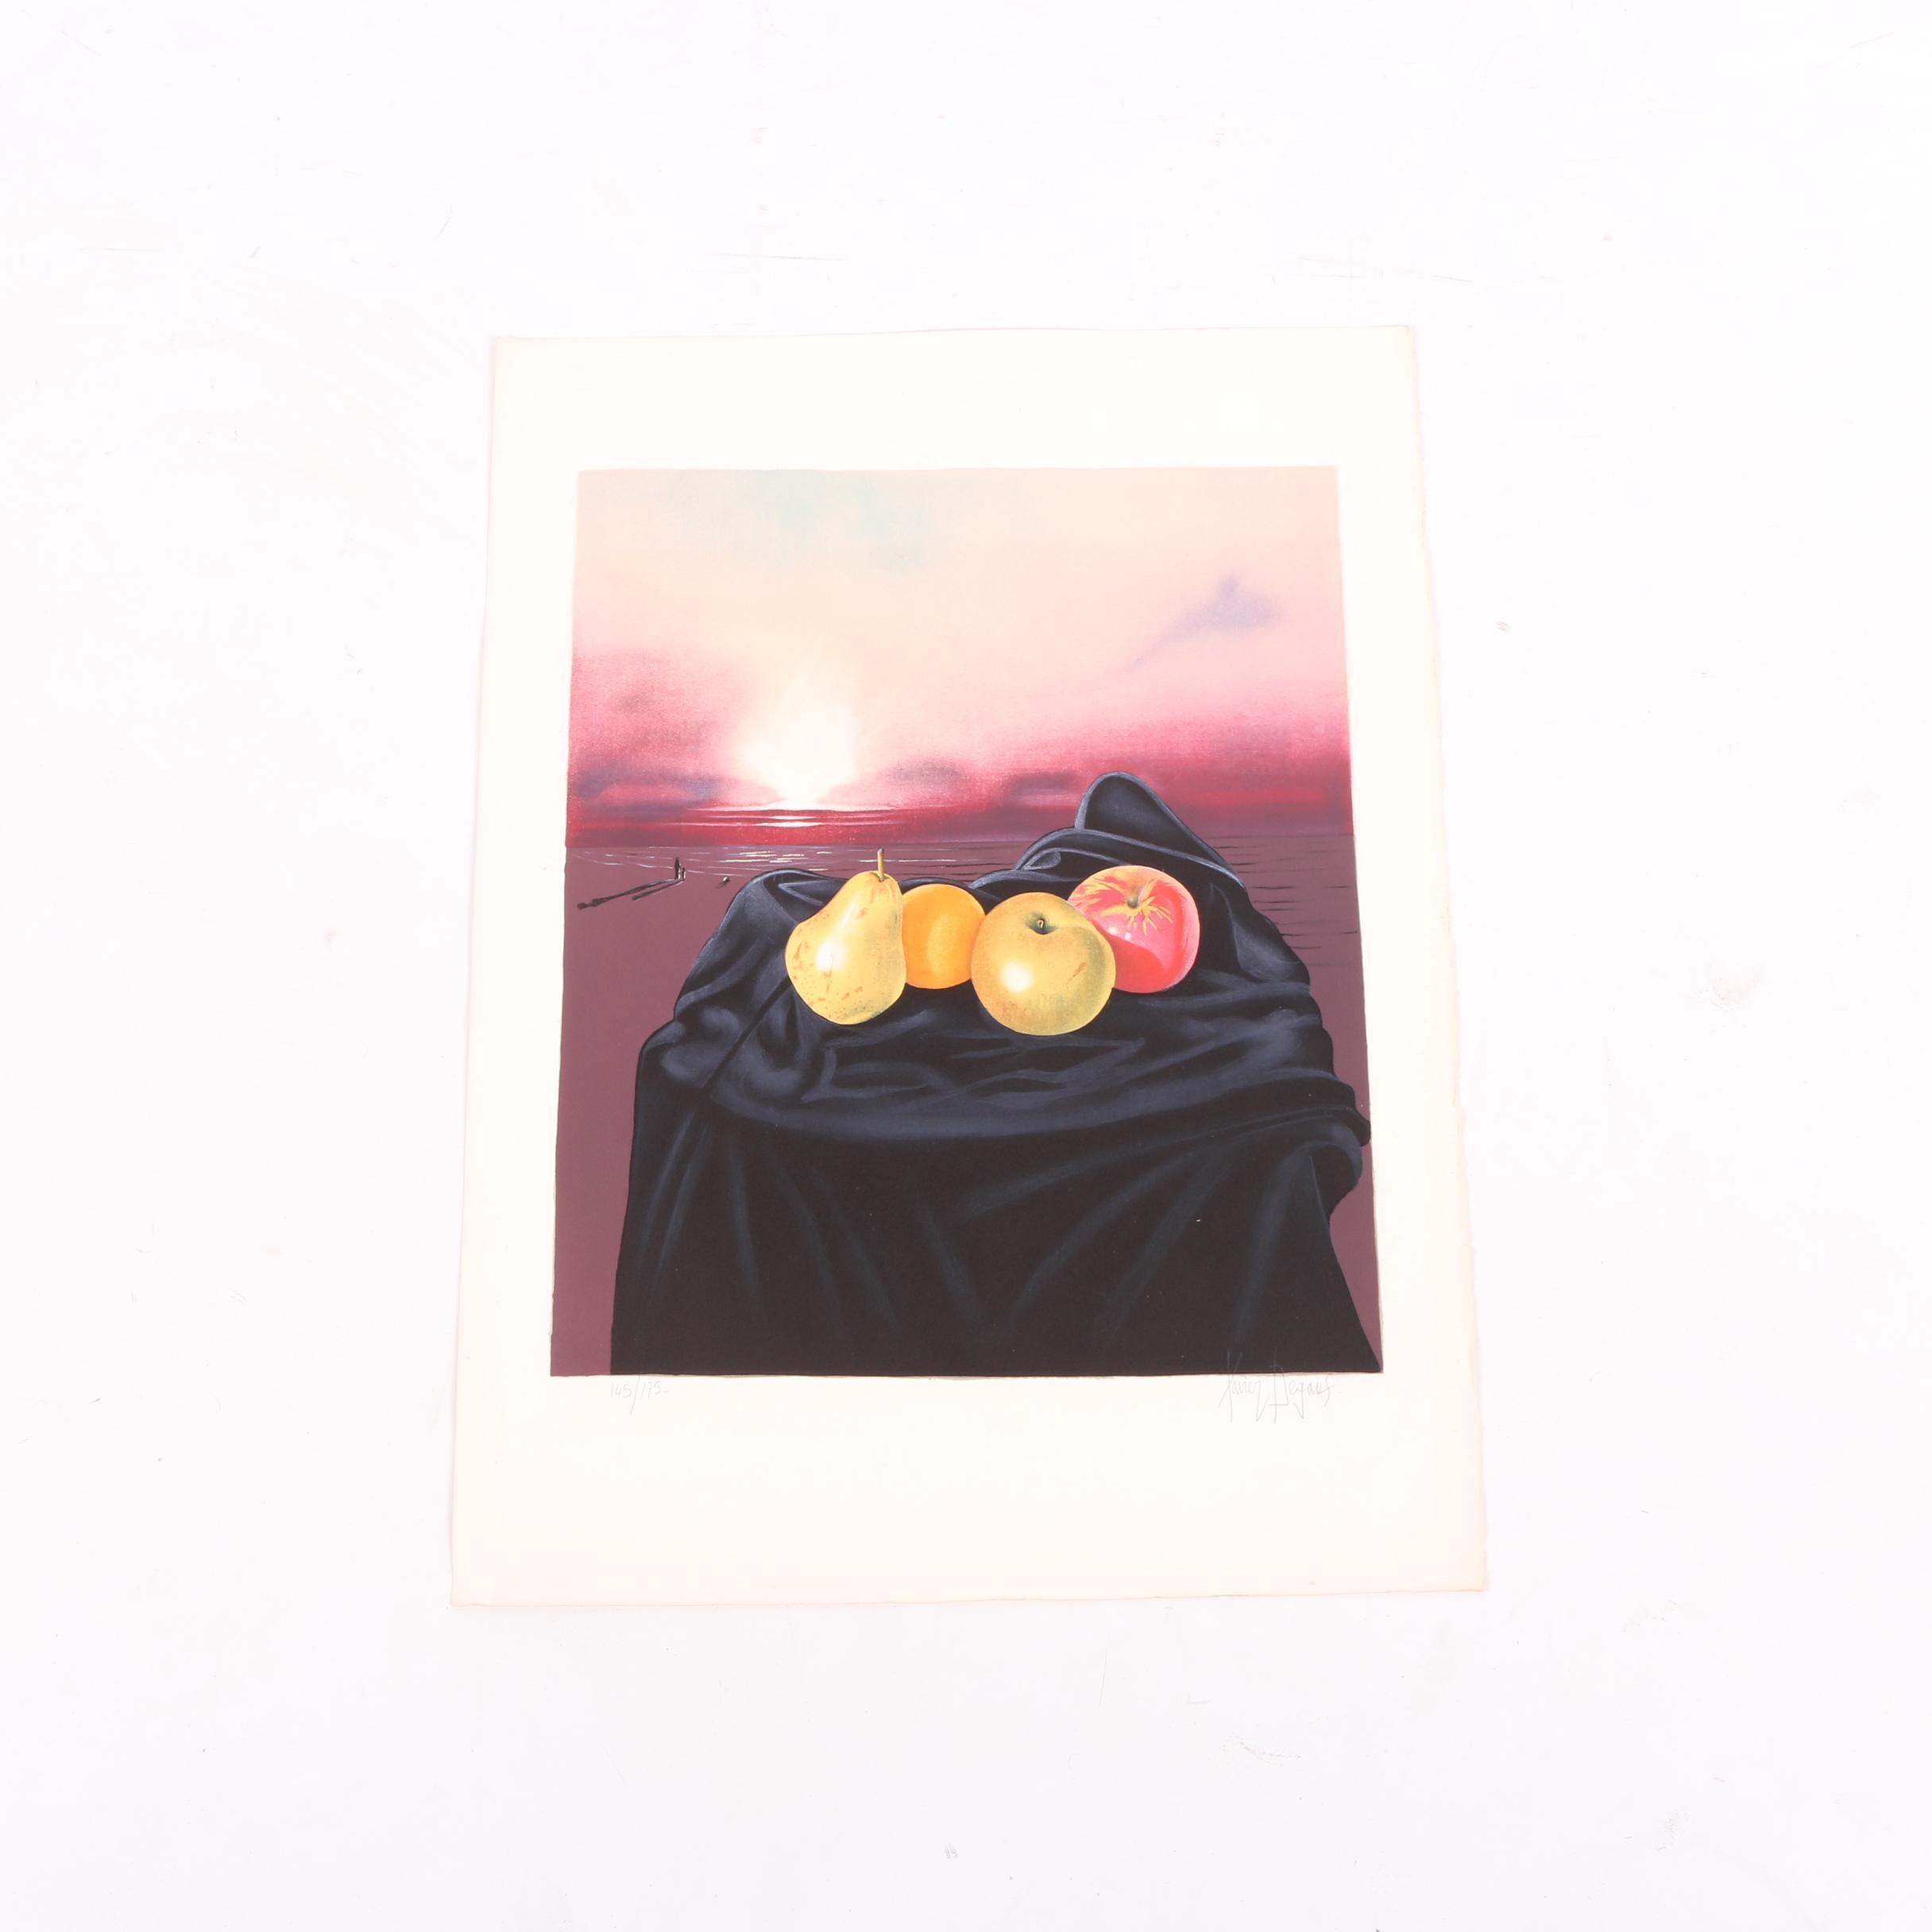 Xavier Degauf Limited Edition Serigraph Print of a Still Life